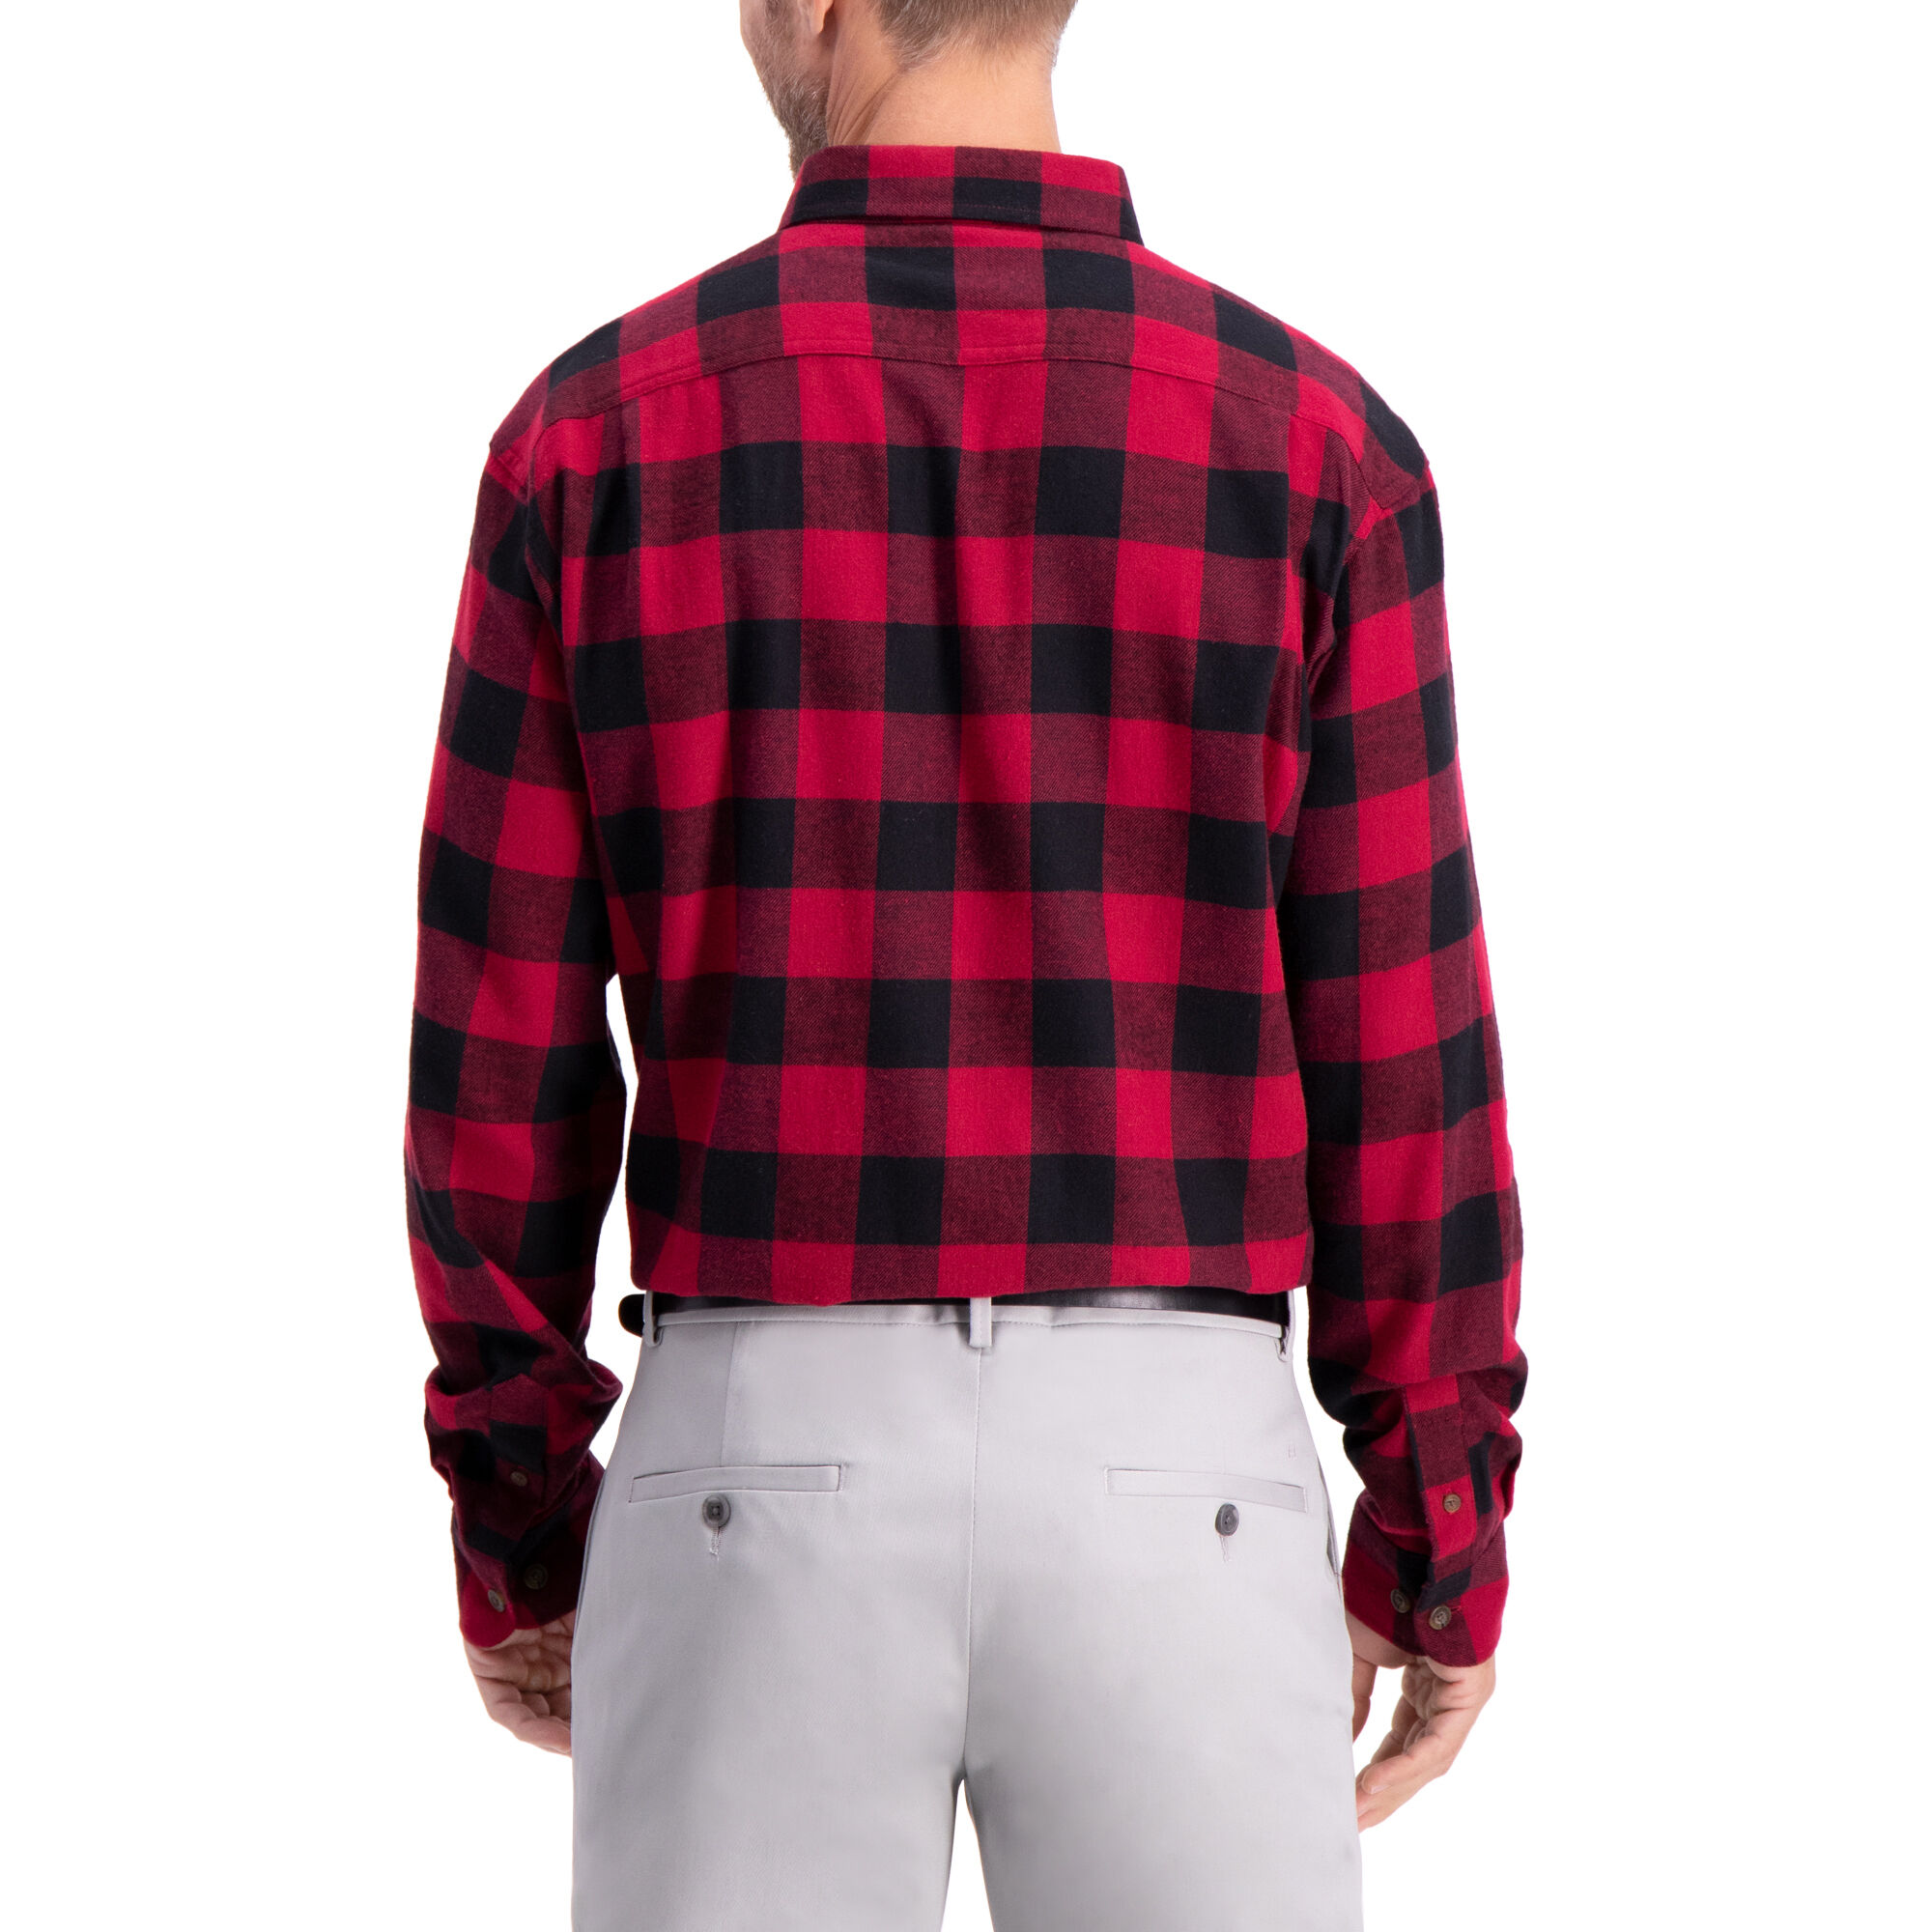 e57d9588ca3 ... Buffalo Plaid Shirt